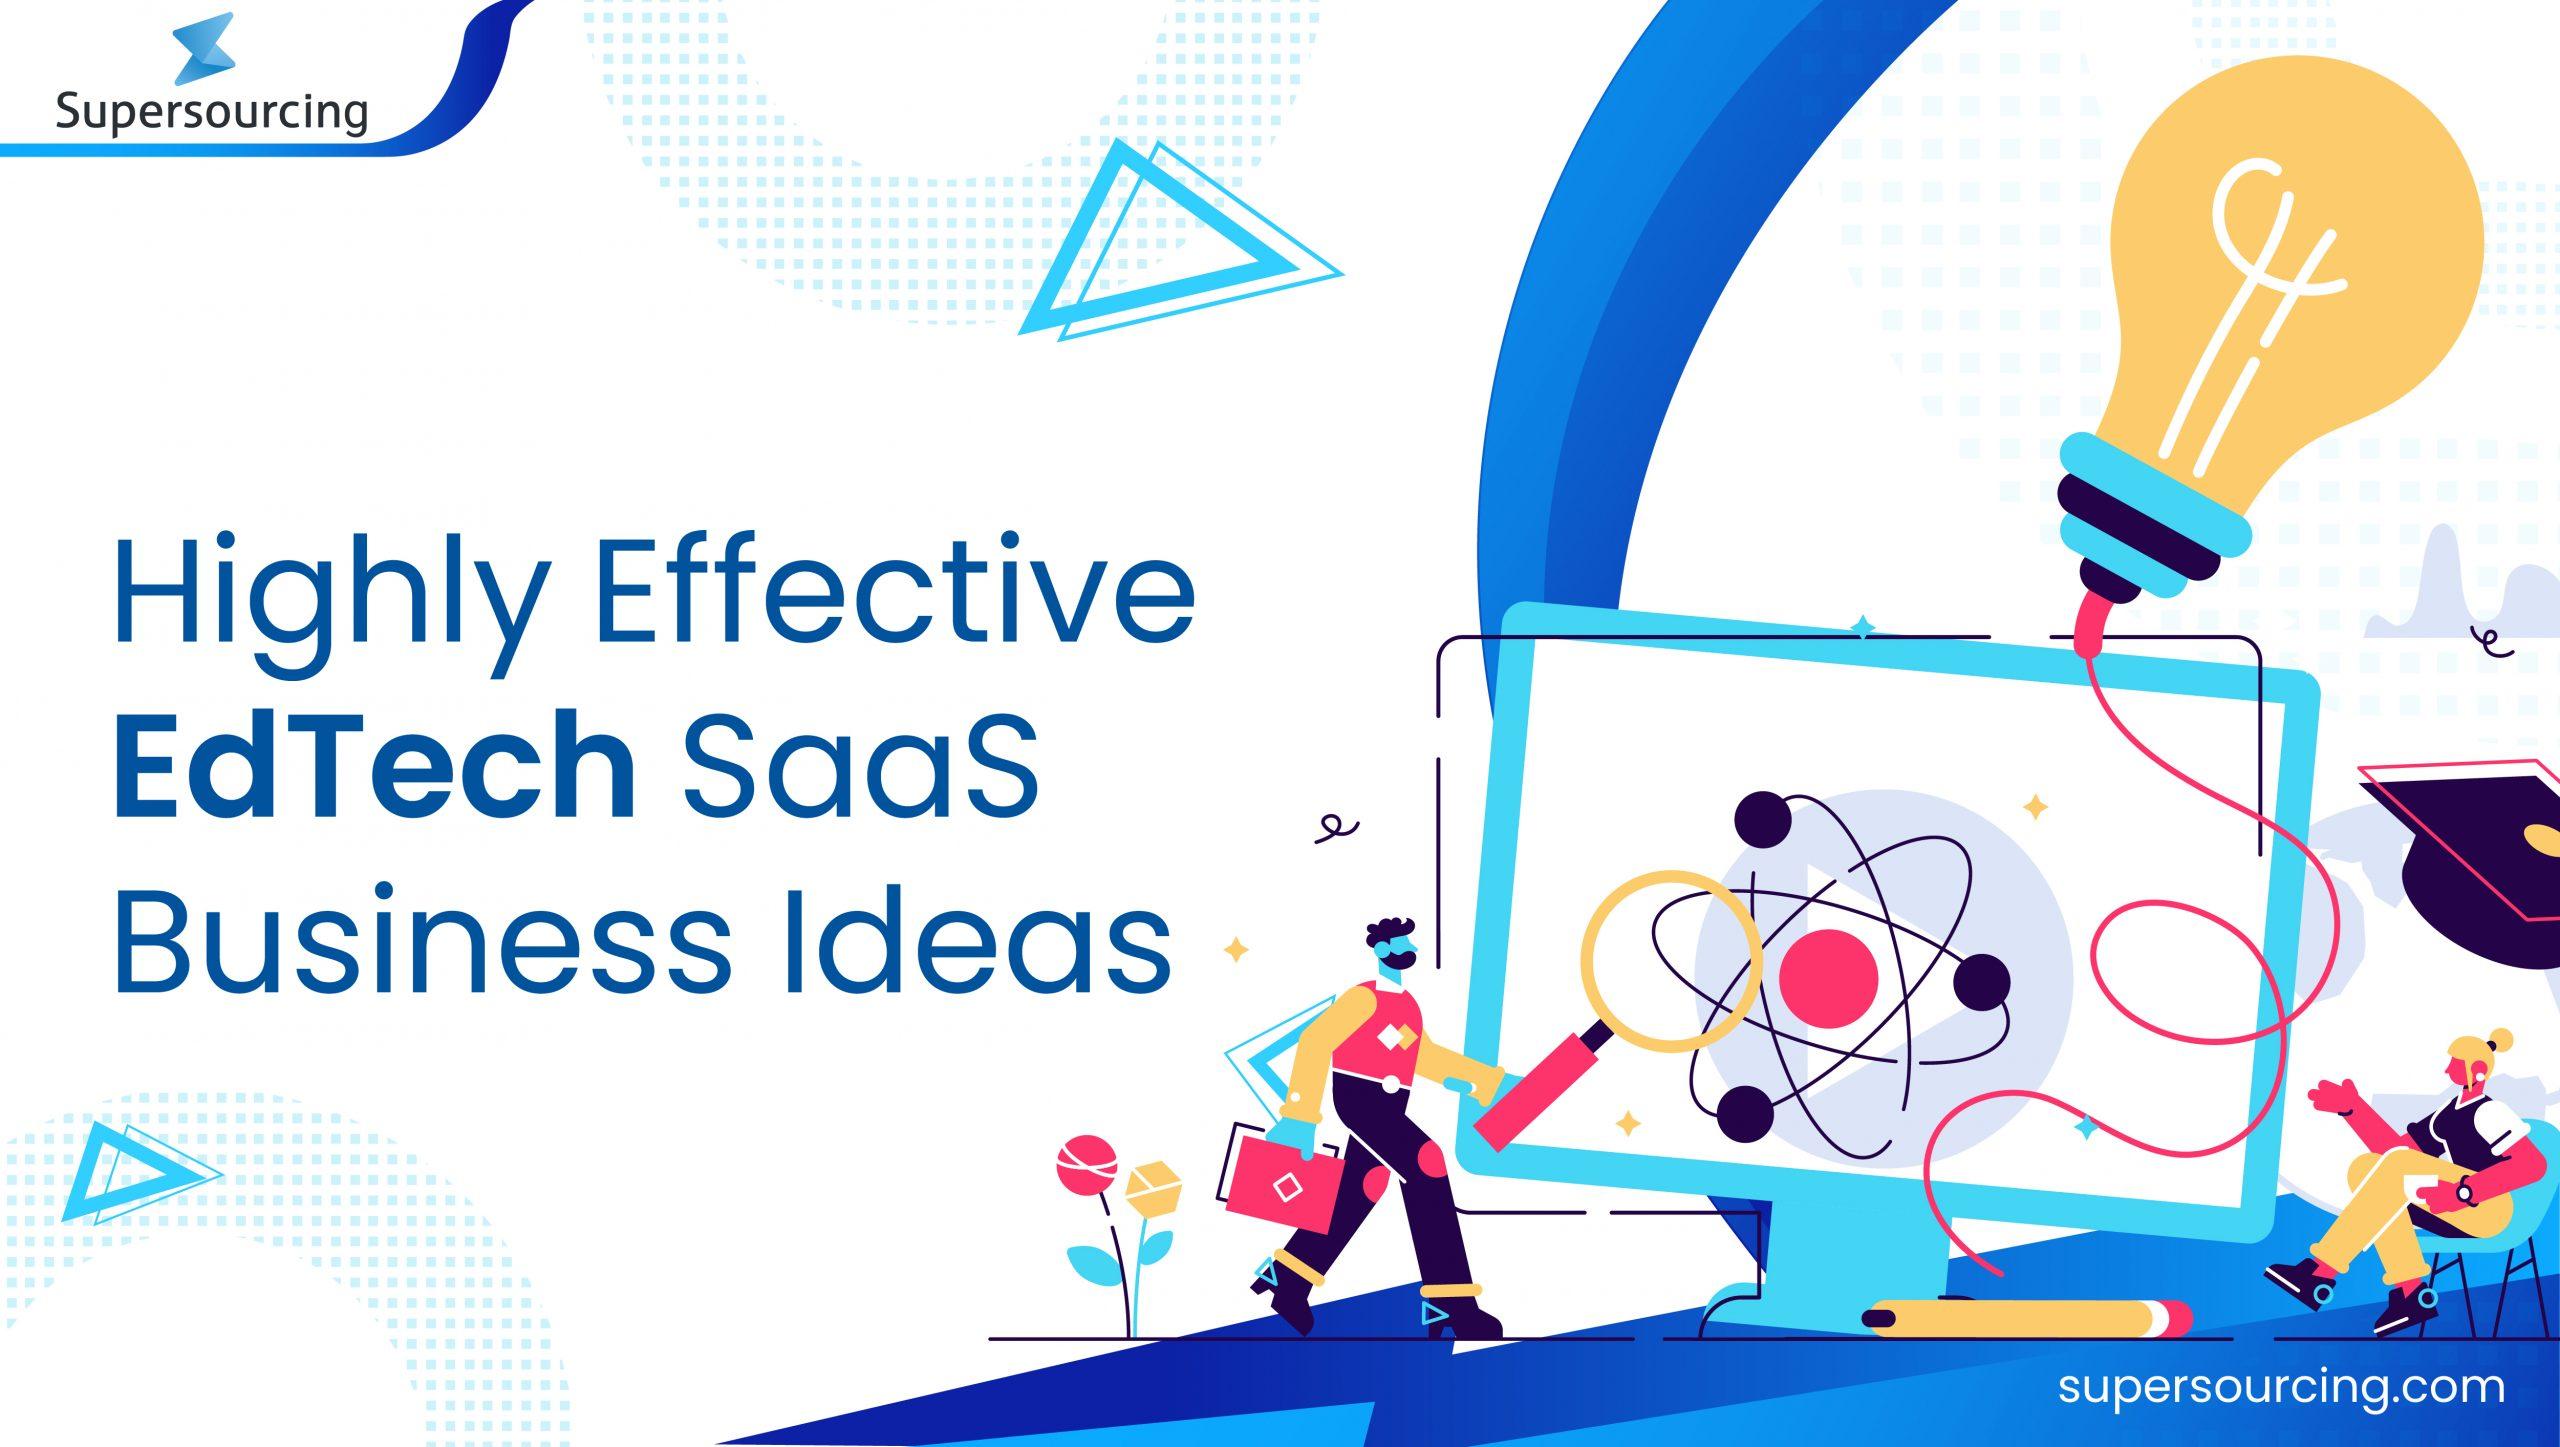 EdTech SaaS ideas